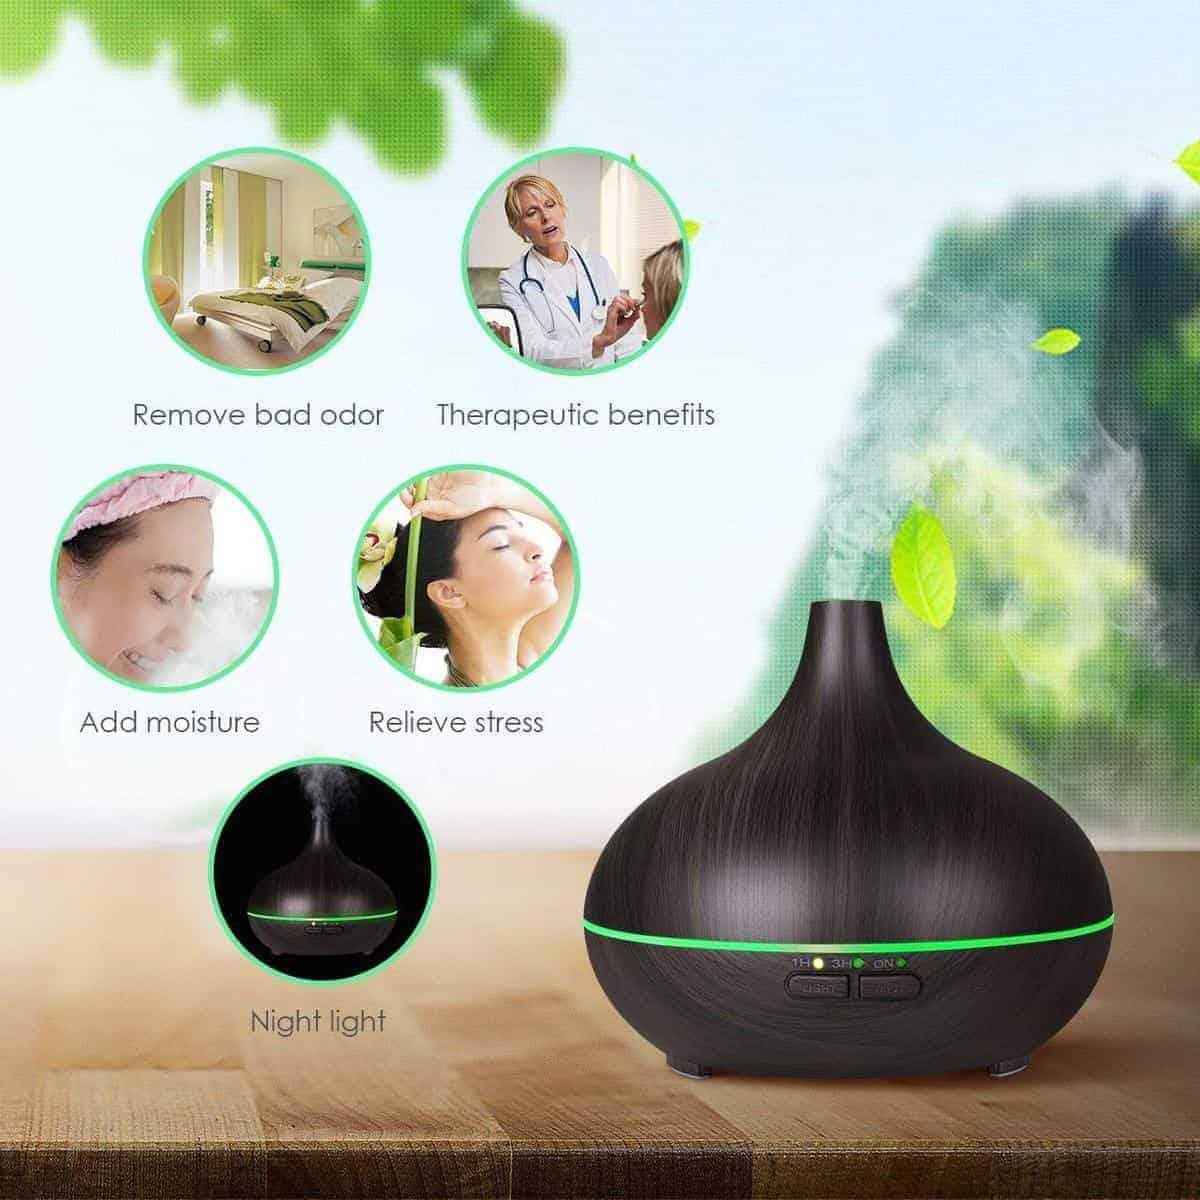 Wasserstein Aromatherapy Essential Oil Diffuser Gift Set (Aromatic Health)